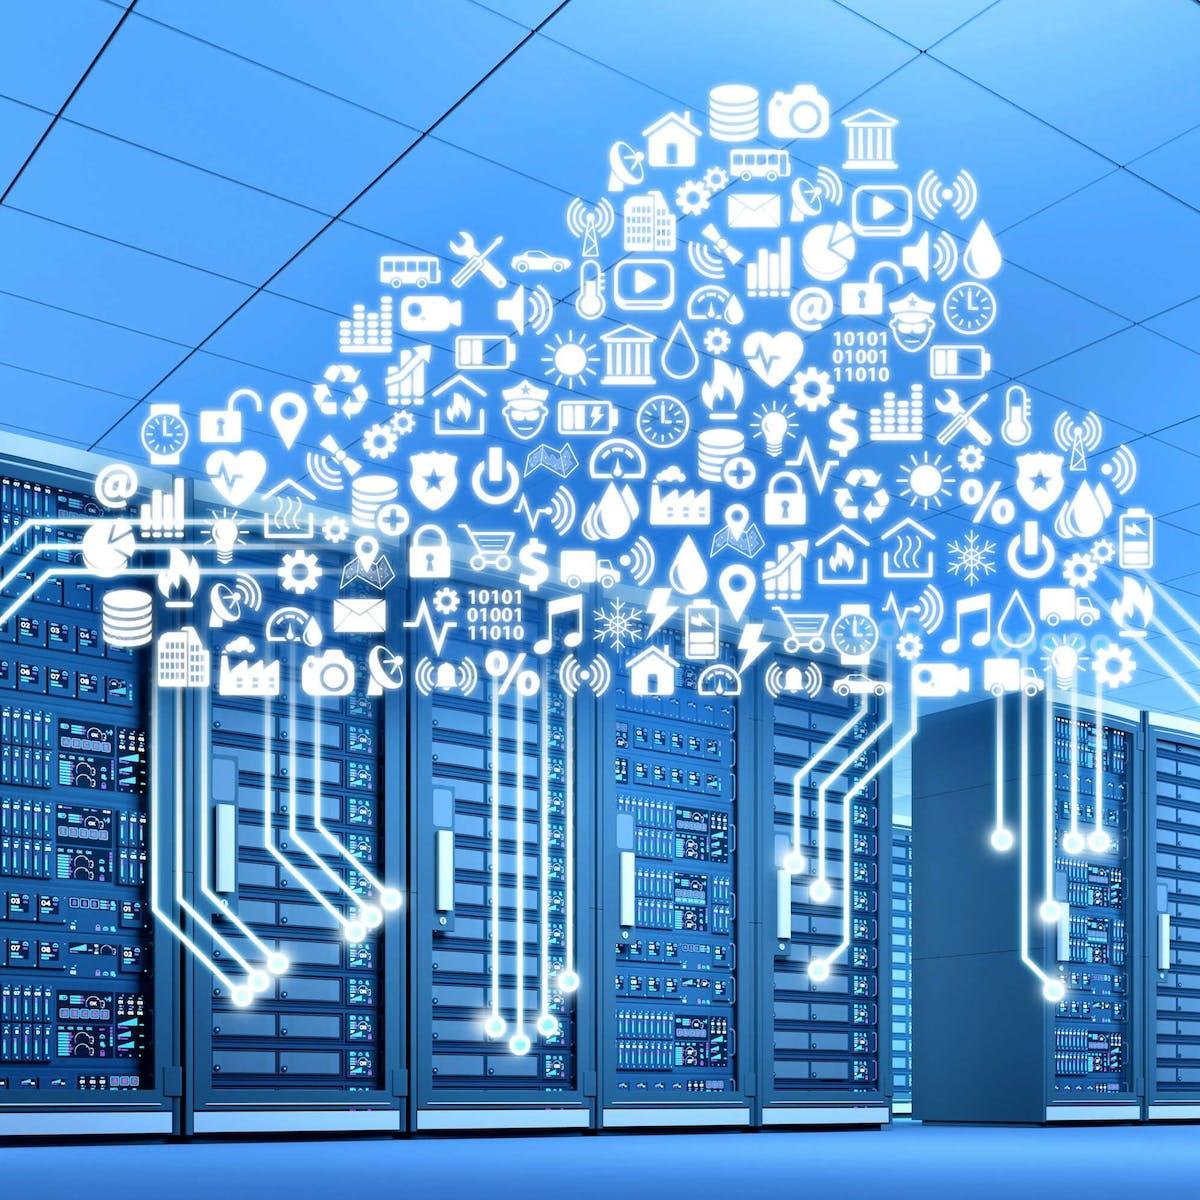 Titelbild-Rechenzentrum-Server-Raum-Daten-Cloud-Rendering-iStock-513118656-Maxiphoto